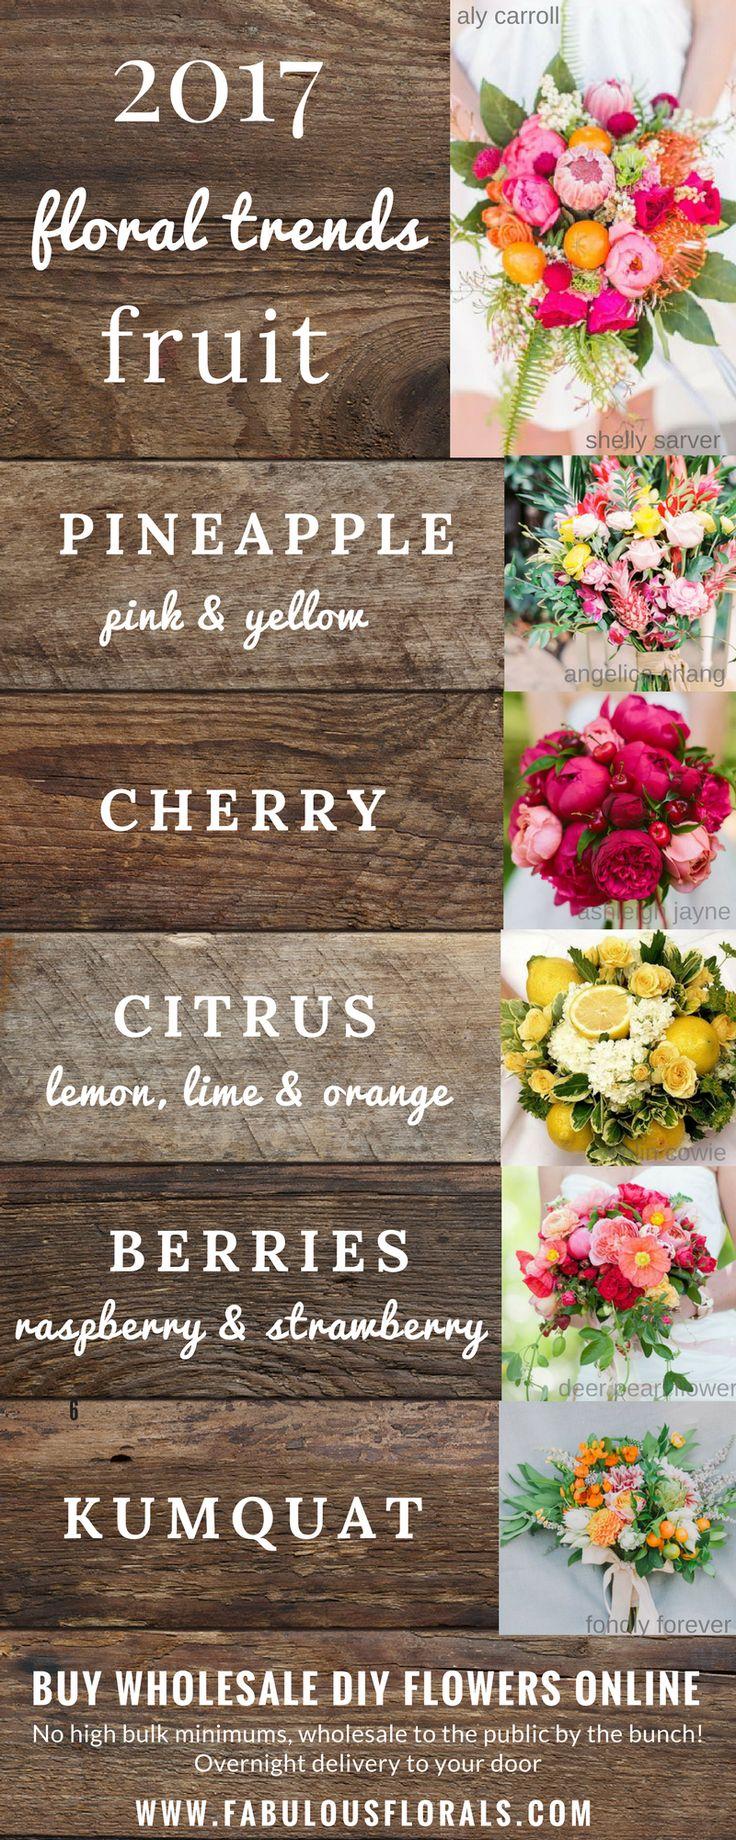 2017 Popular Floral Arrangement Trends - Fruits. 2017 Wedding Bouquet with Fruit Trends